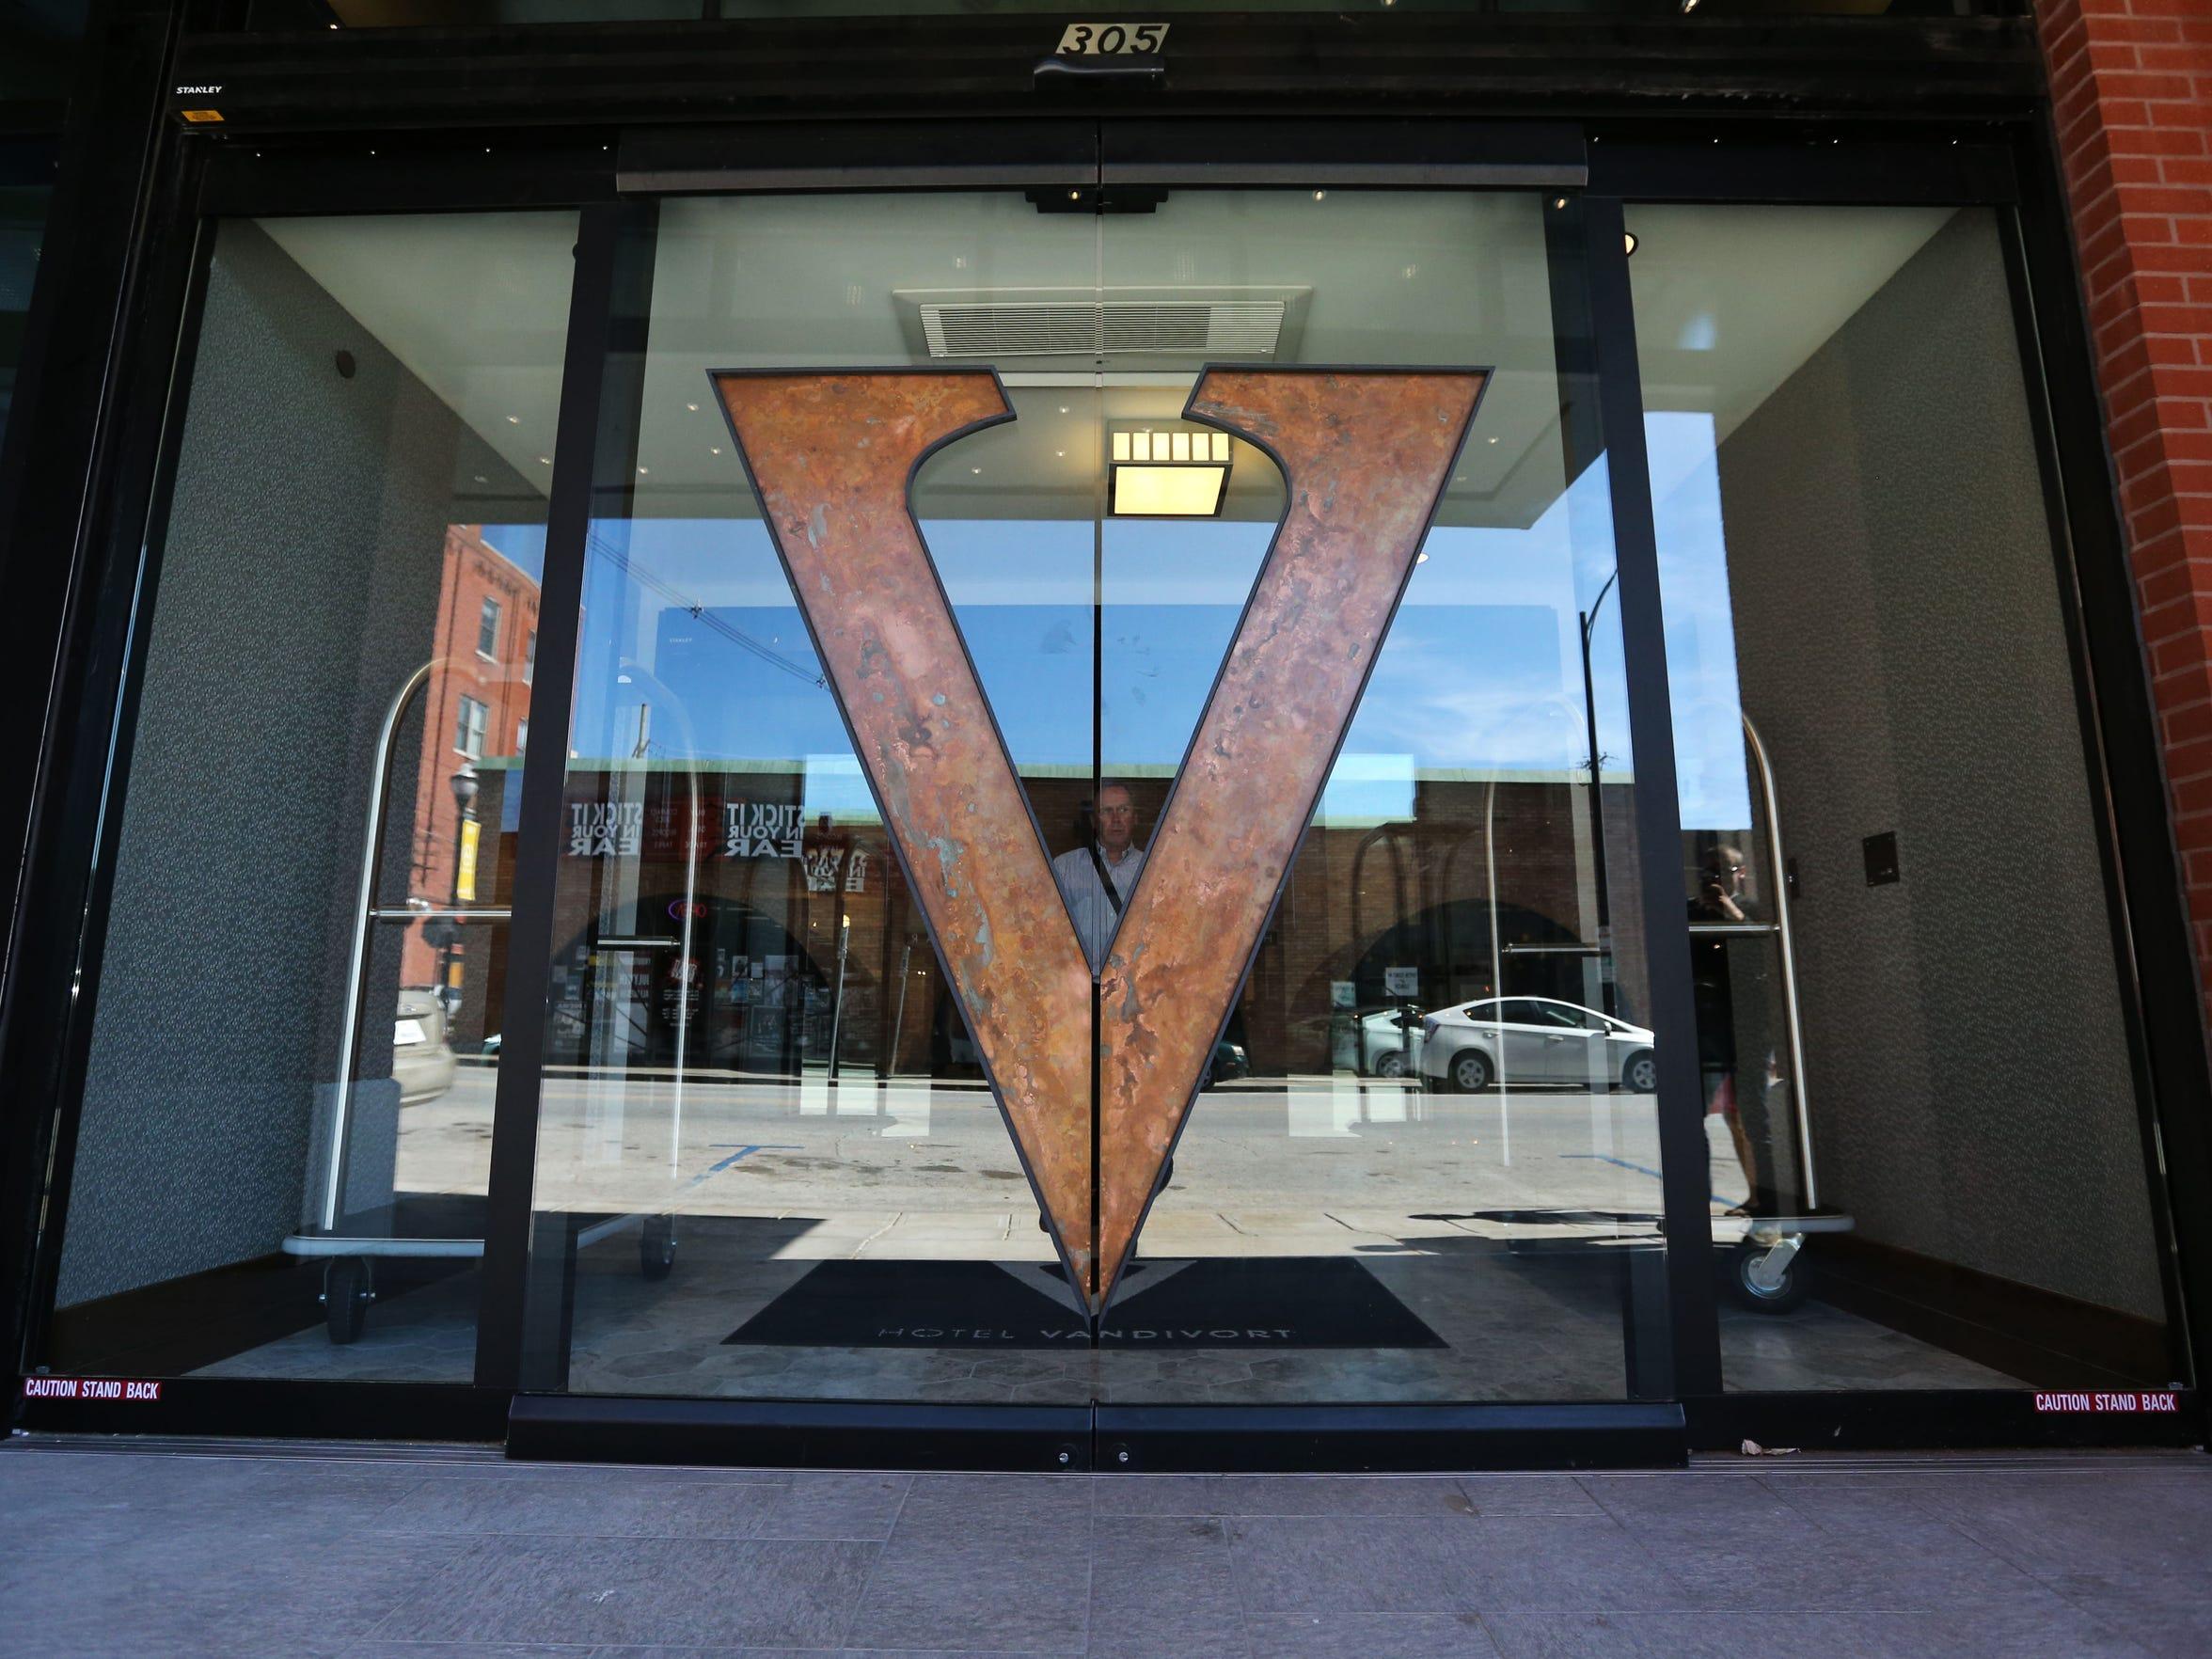 The logo of the Hotel Vandivort, features negative